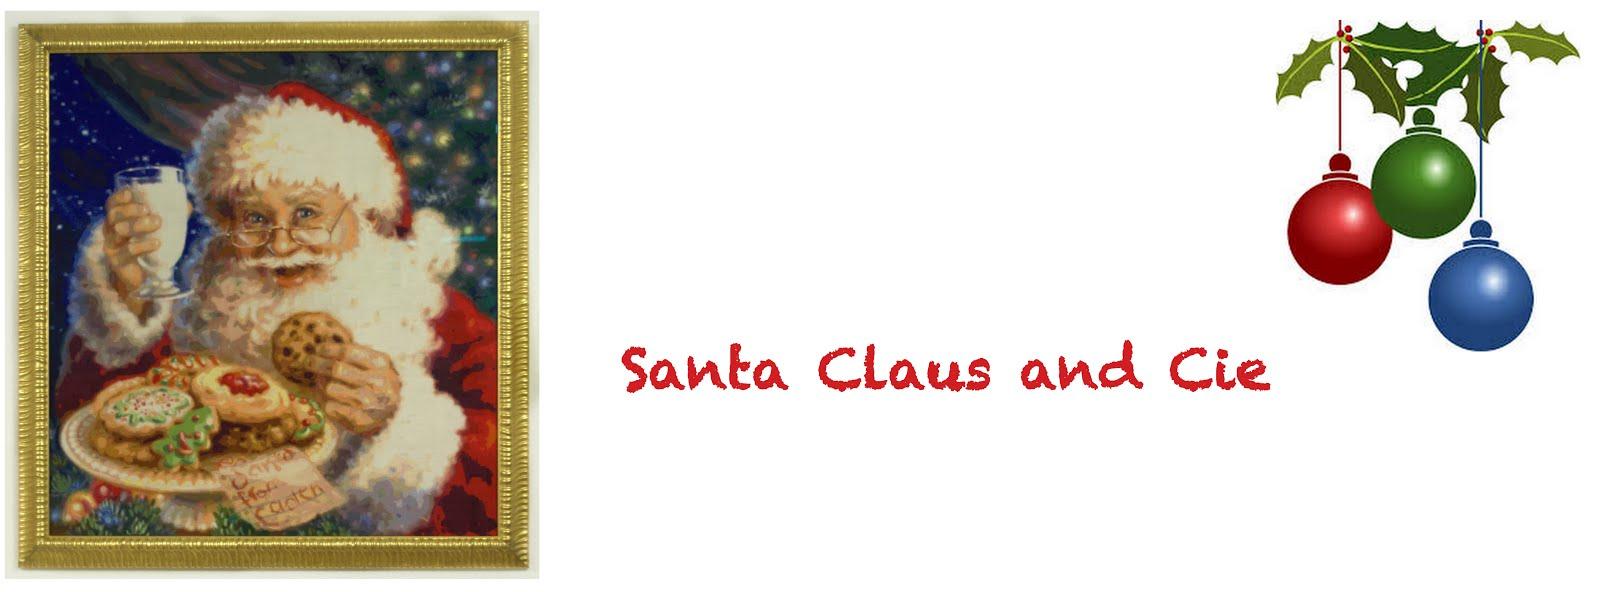 santa claus and cie